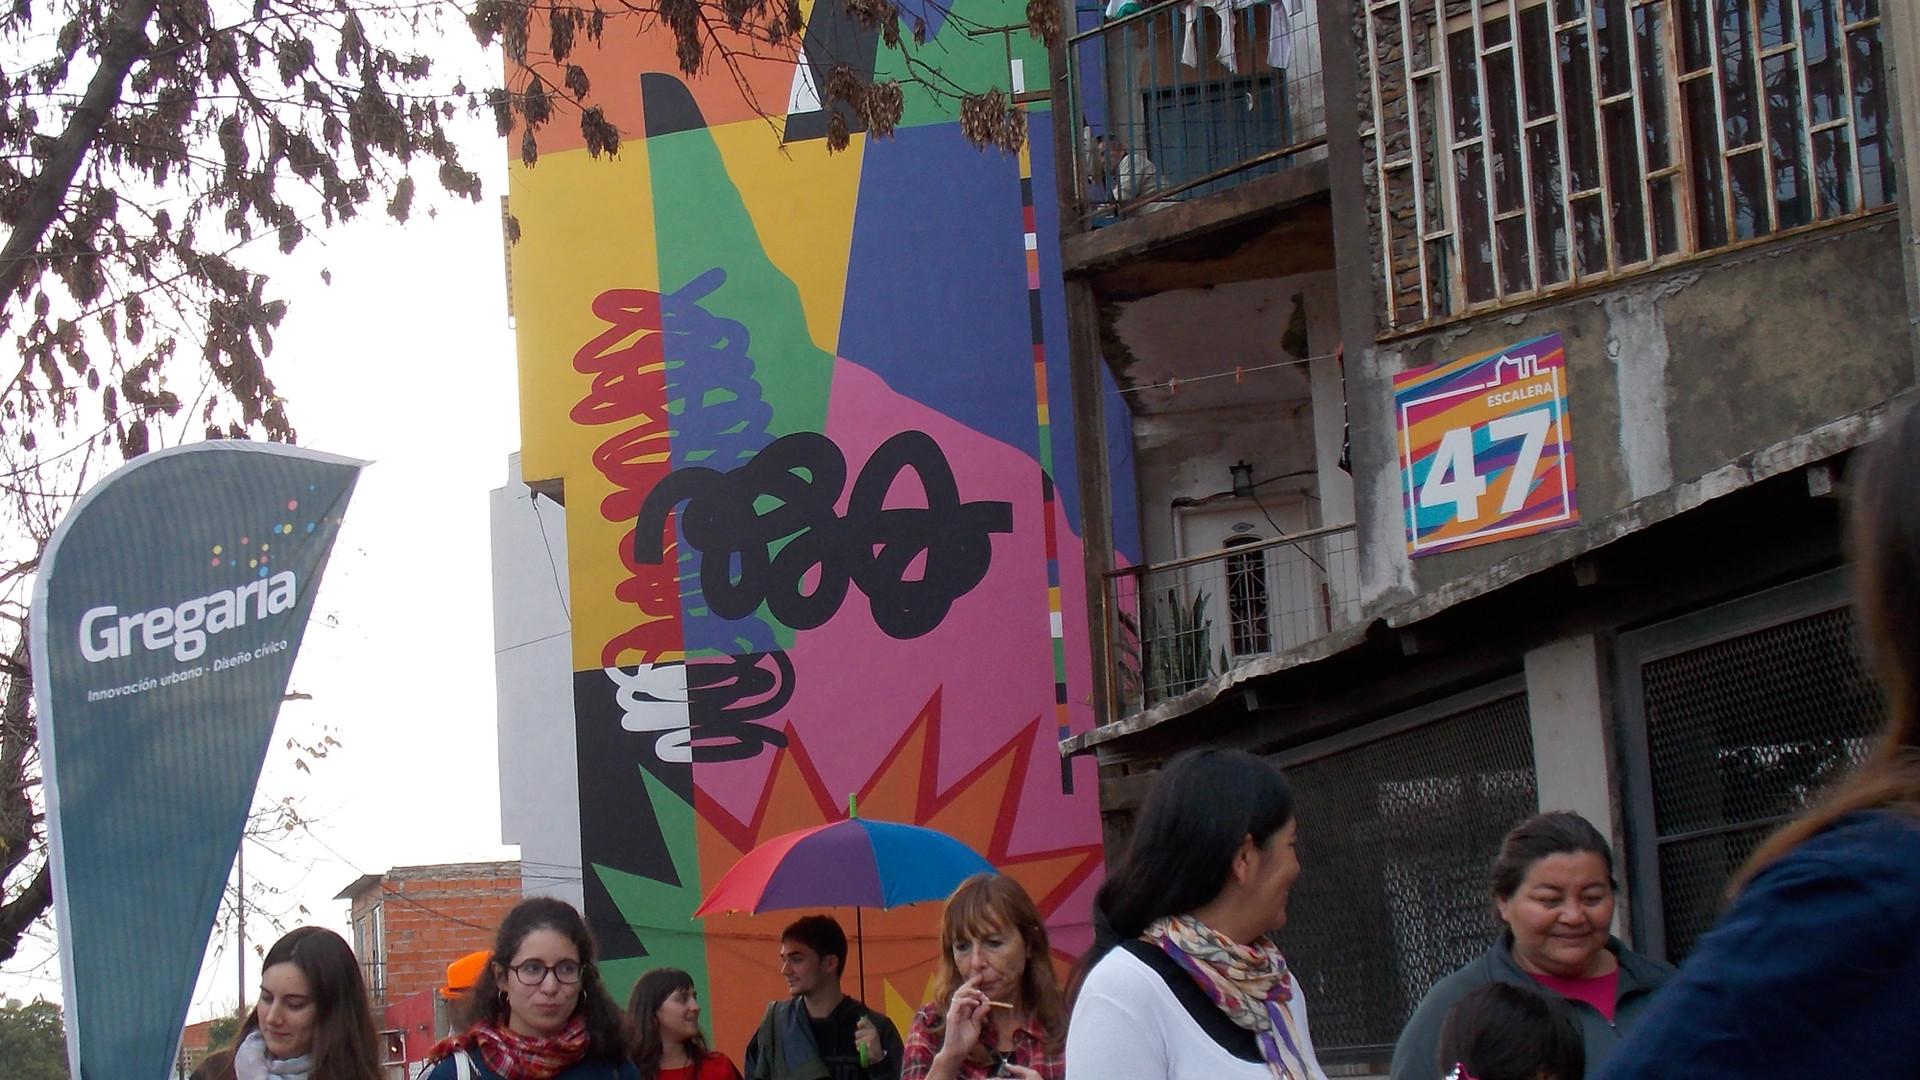 Escalera 47: Julio Menna